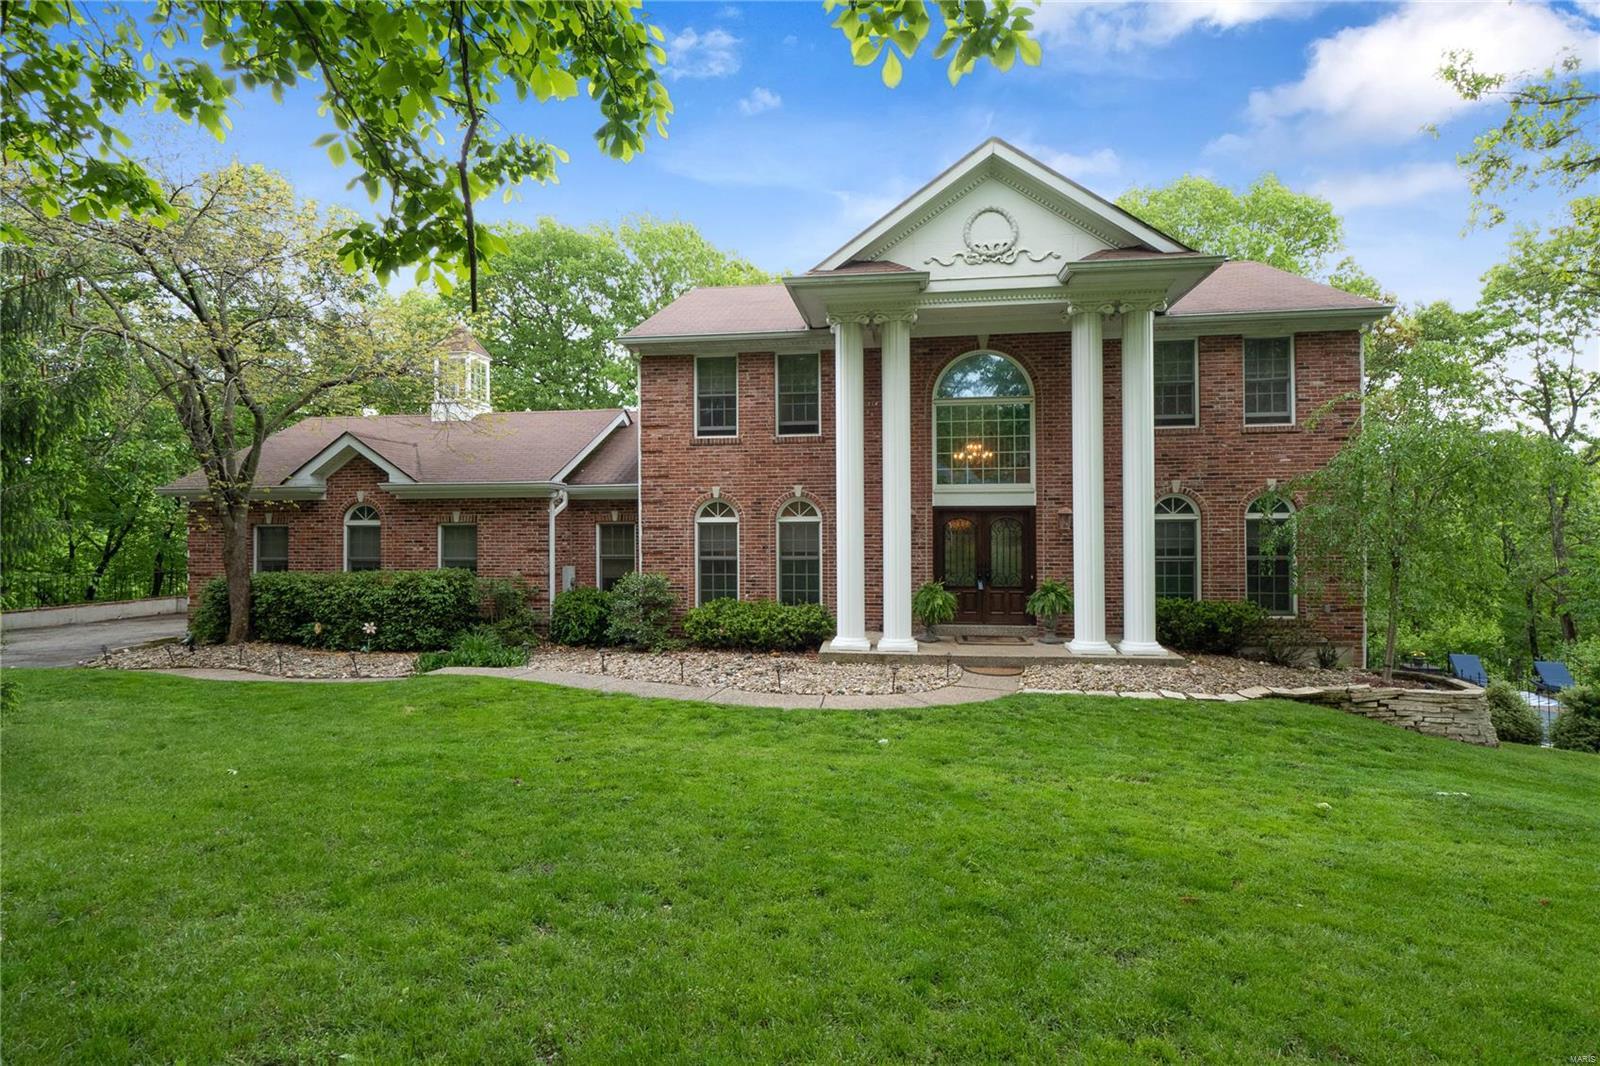 16215 Thornberry Ridge Lane Property Photo - Glencoe, MO real estate listing